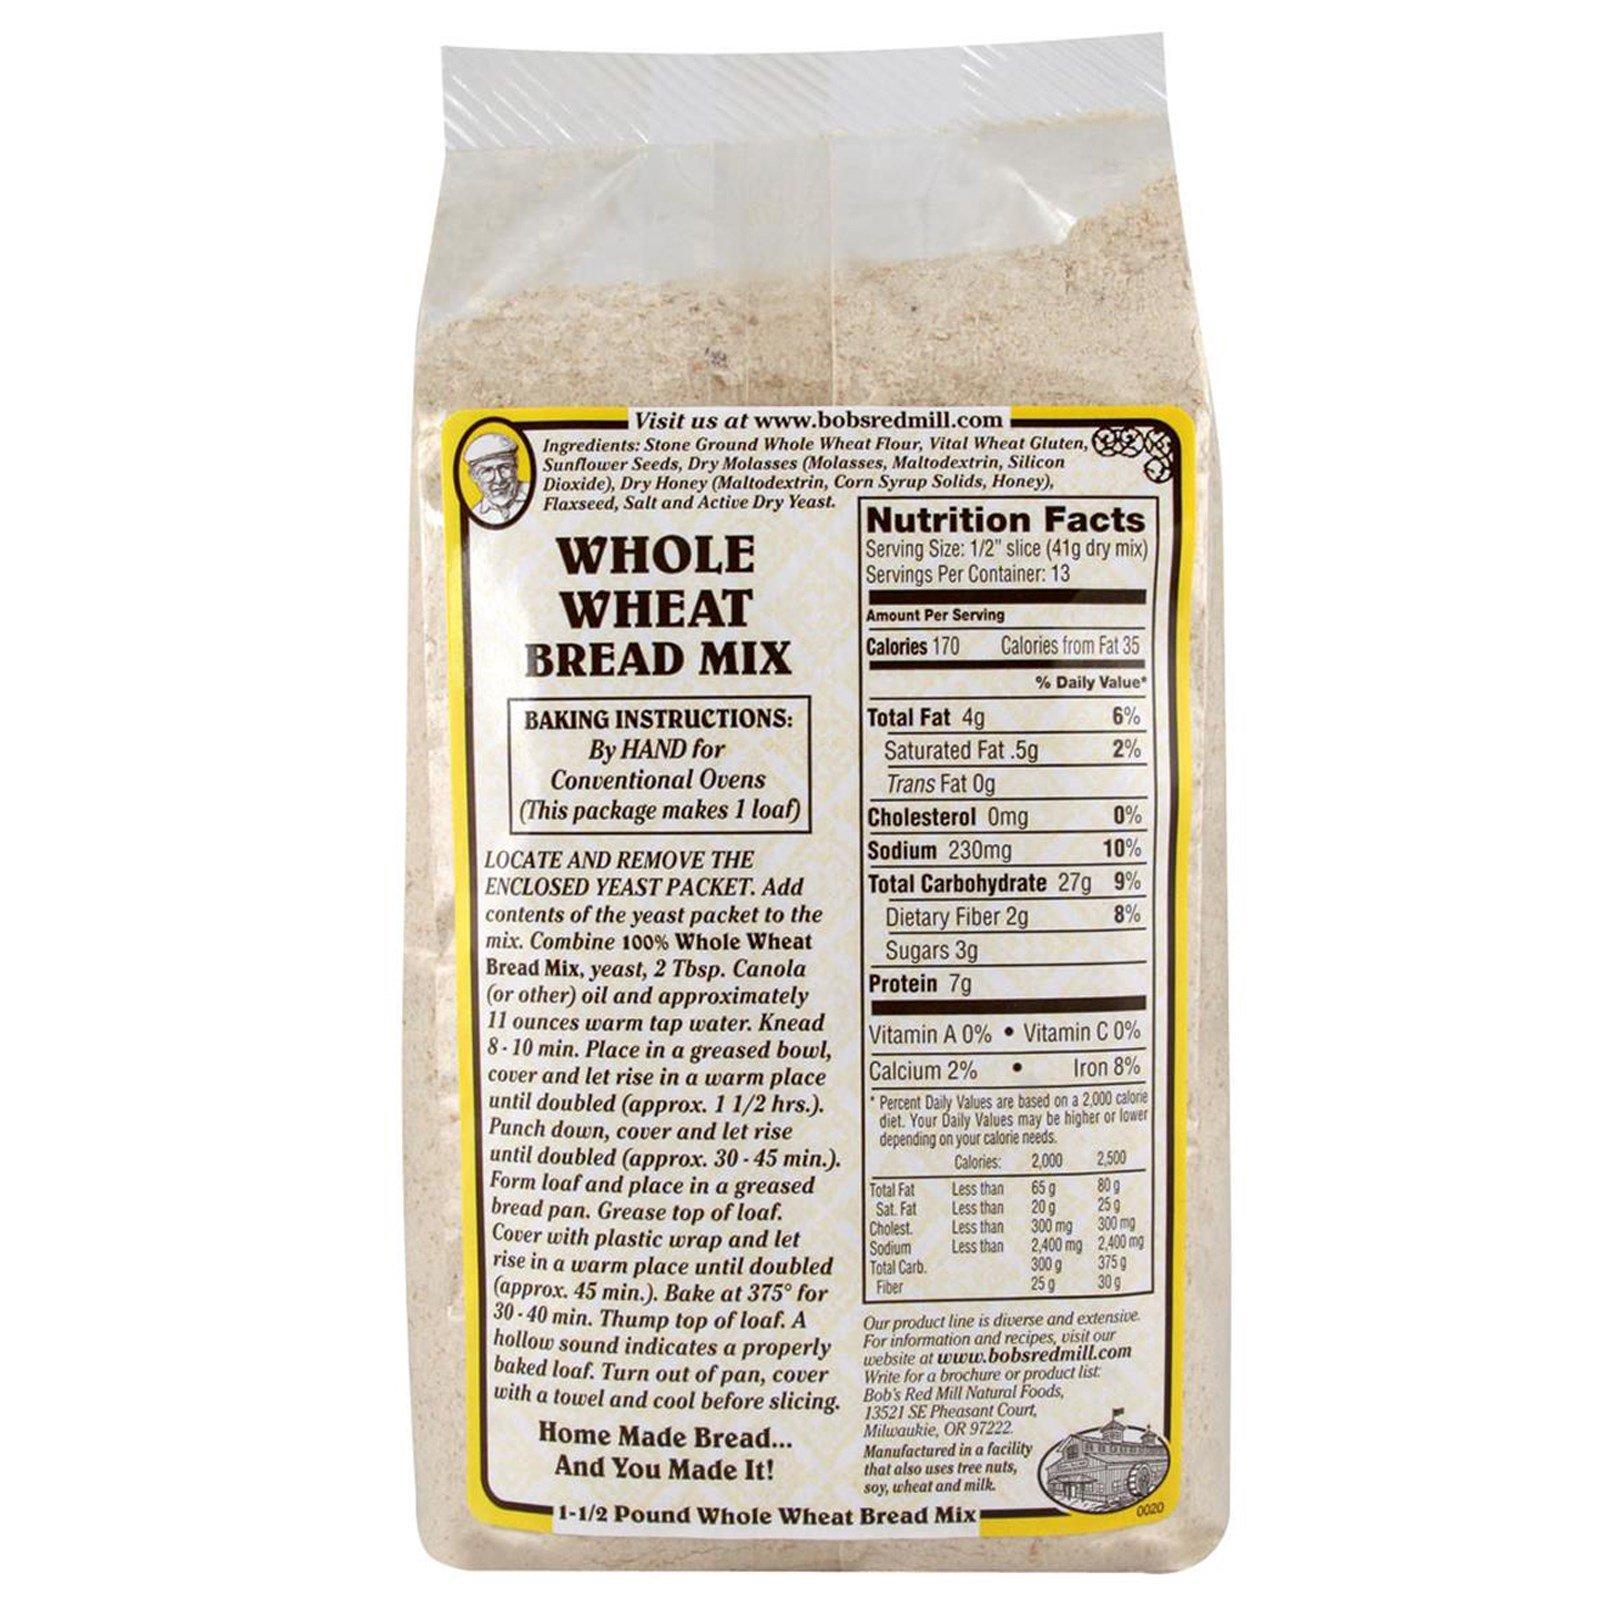 Nutrition News: nutrition facts vital wheat gluten